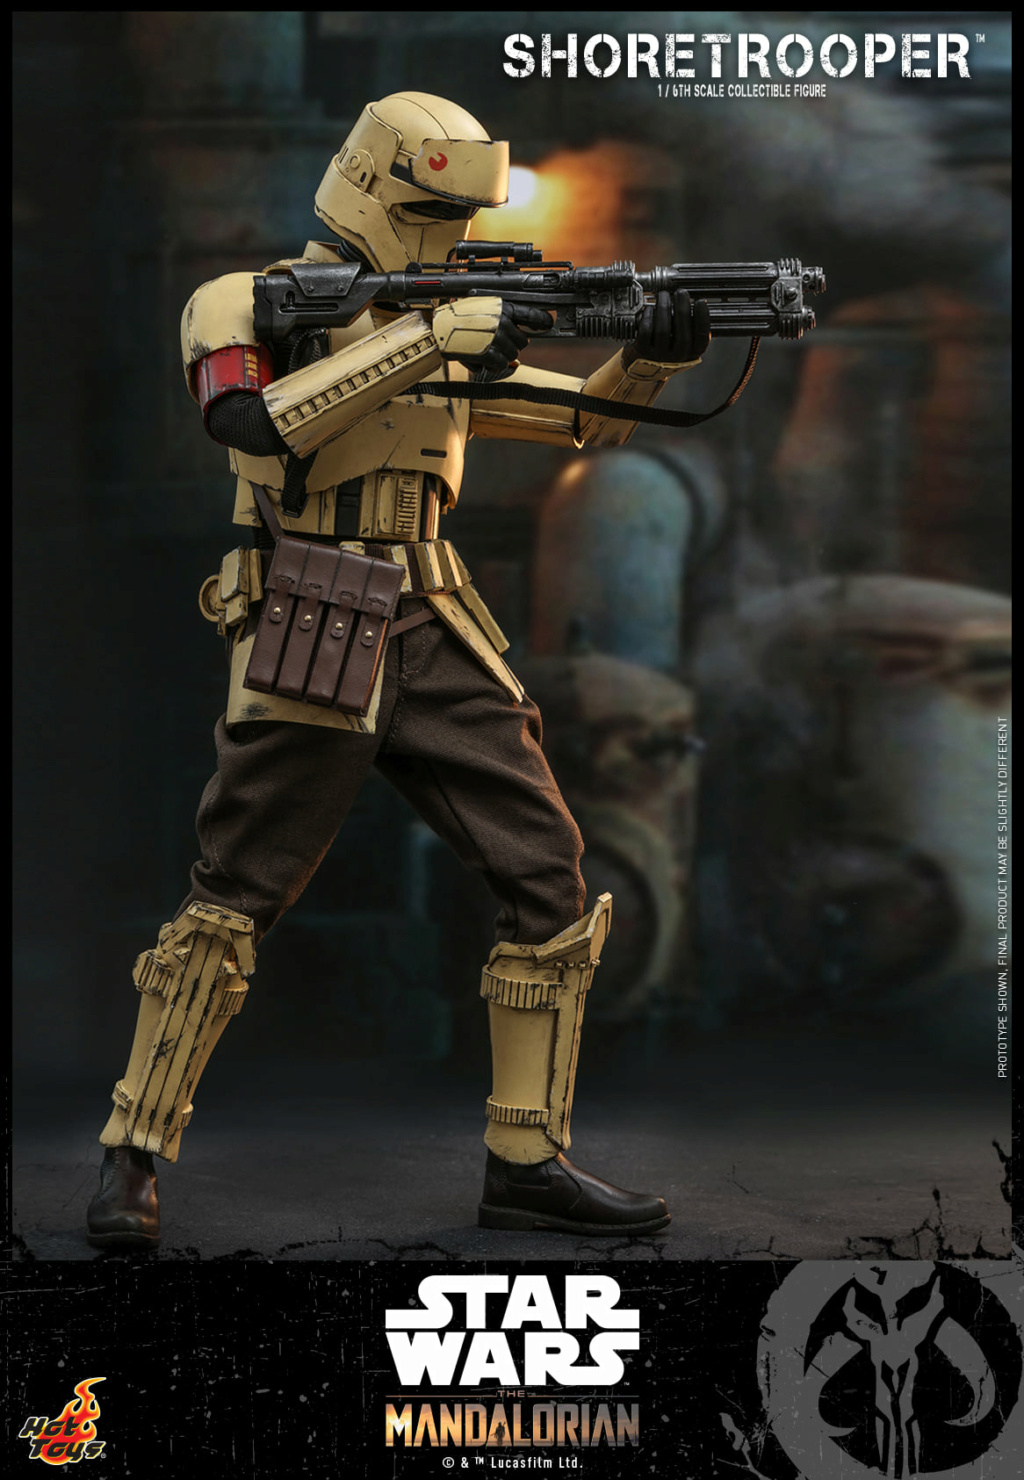 Shoretrooper 1/6 Collectible Figure The Mandalorian Hot Toys Shoret13